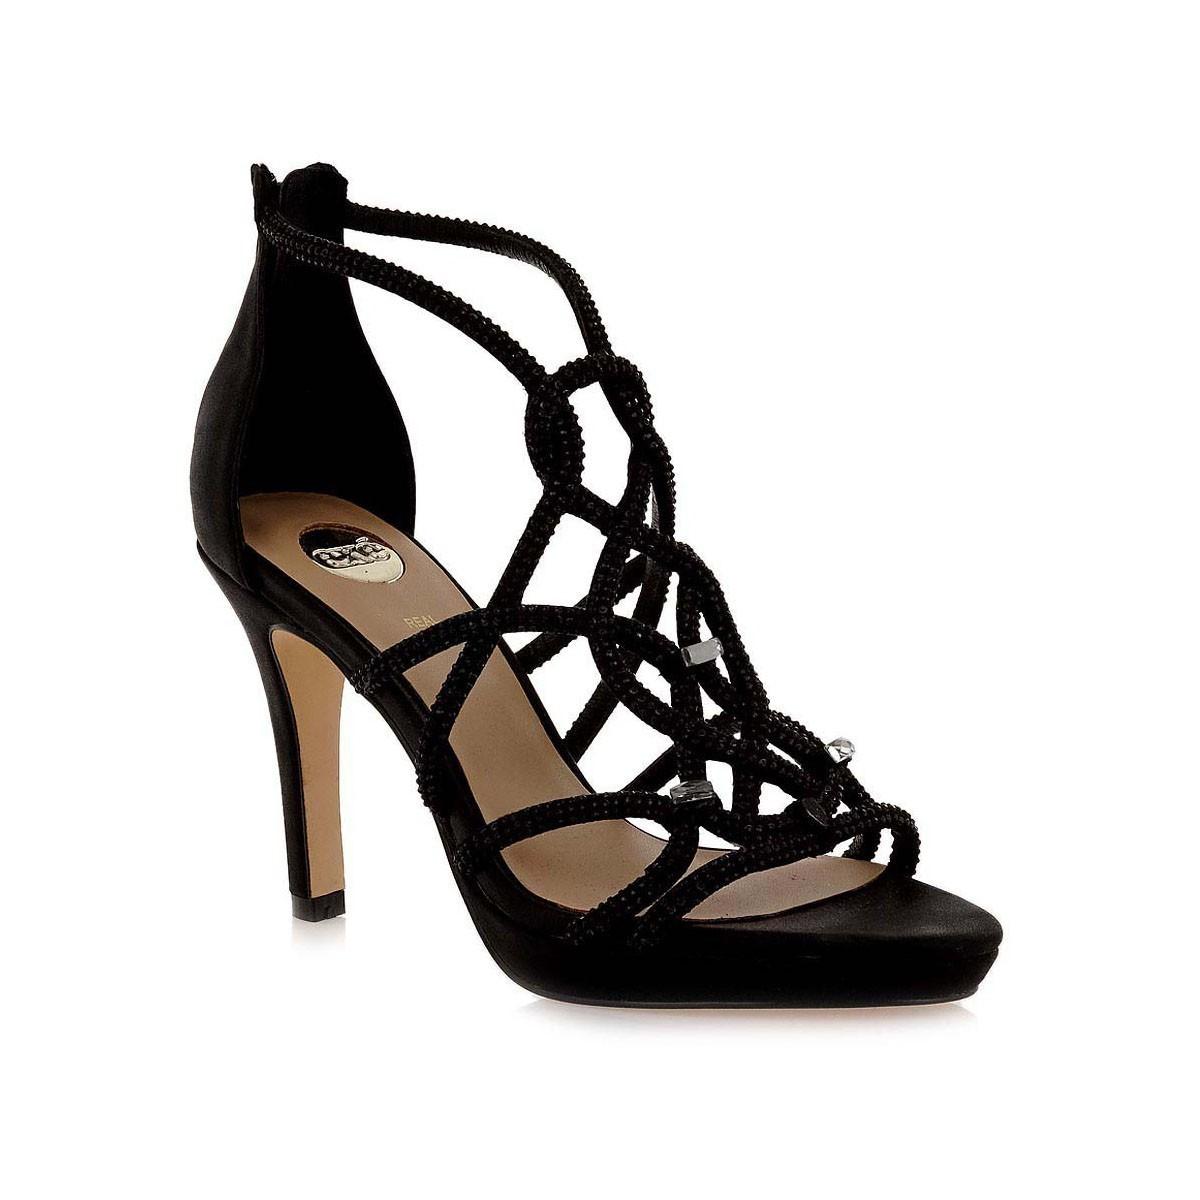 EXE Shoes Πέδιλα Γυναικεία KIMBERLY-663 Μαύρο G47006636001